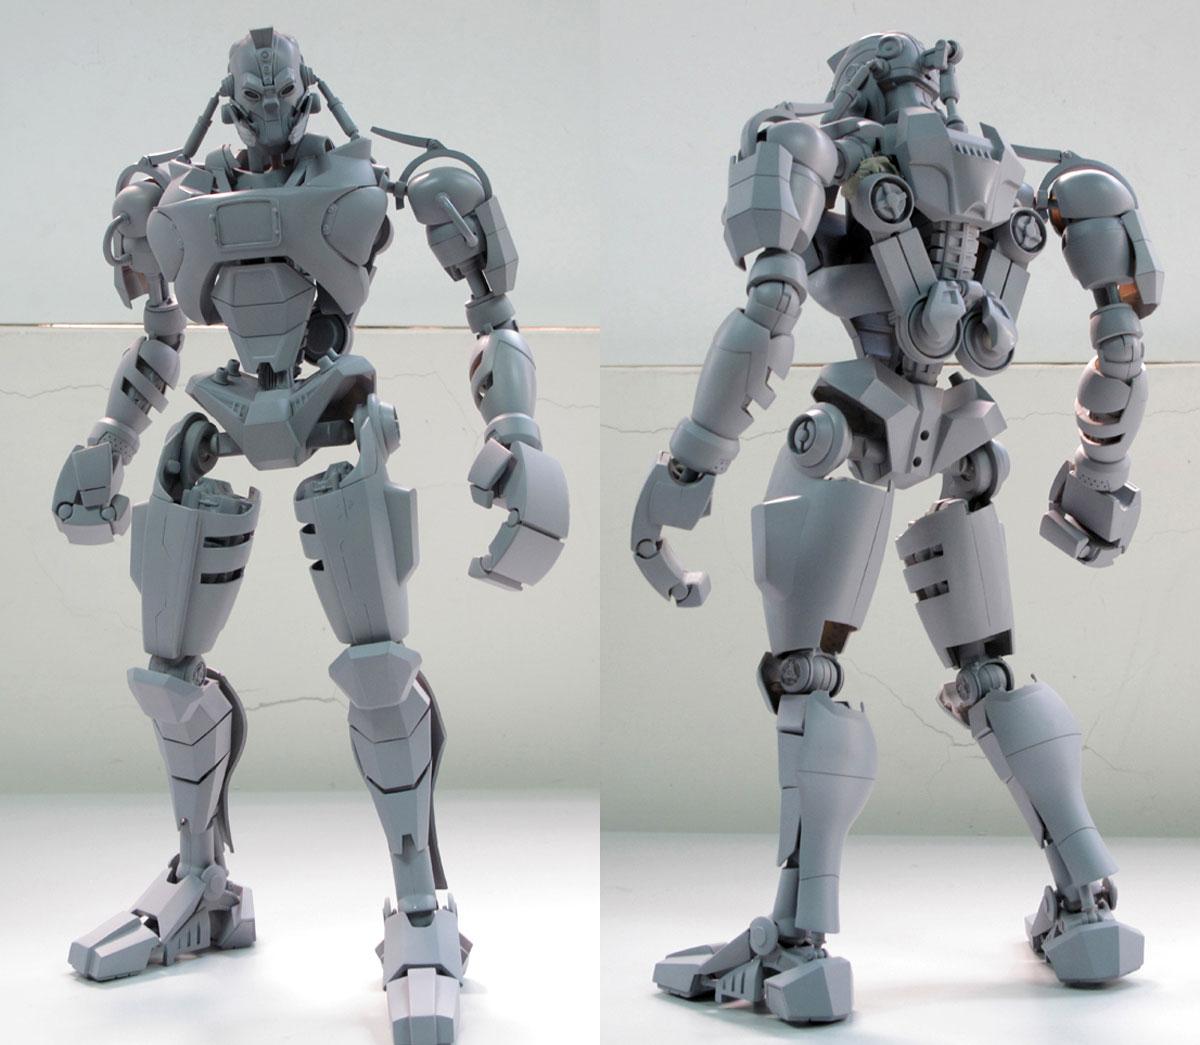 Real Steel Robot Toys | Auto Design Tech